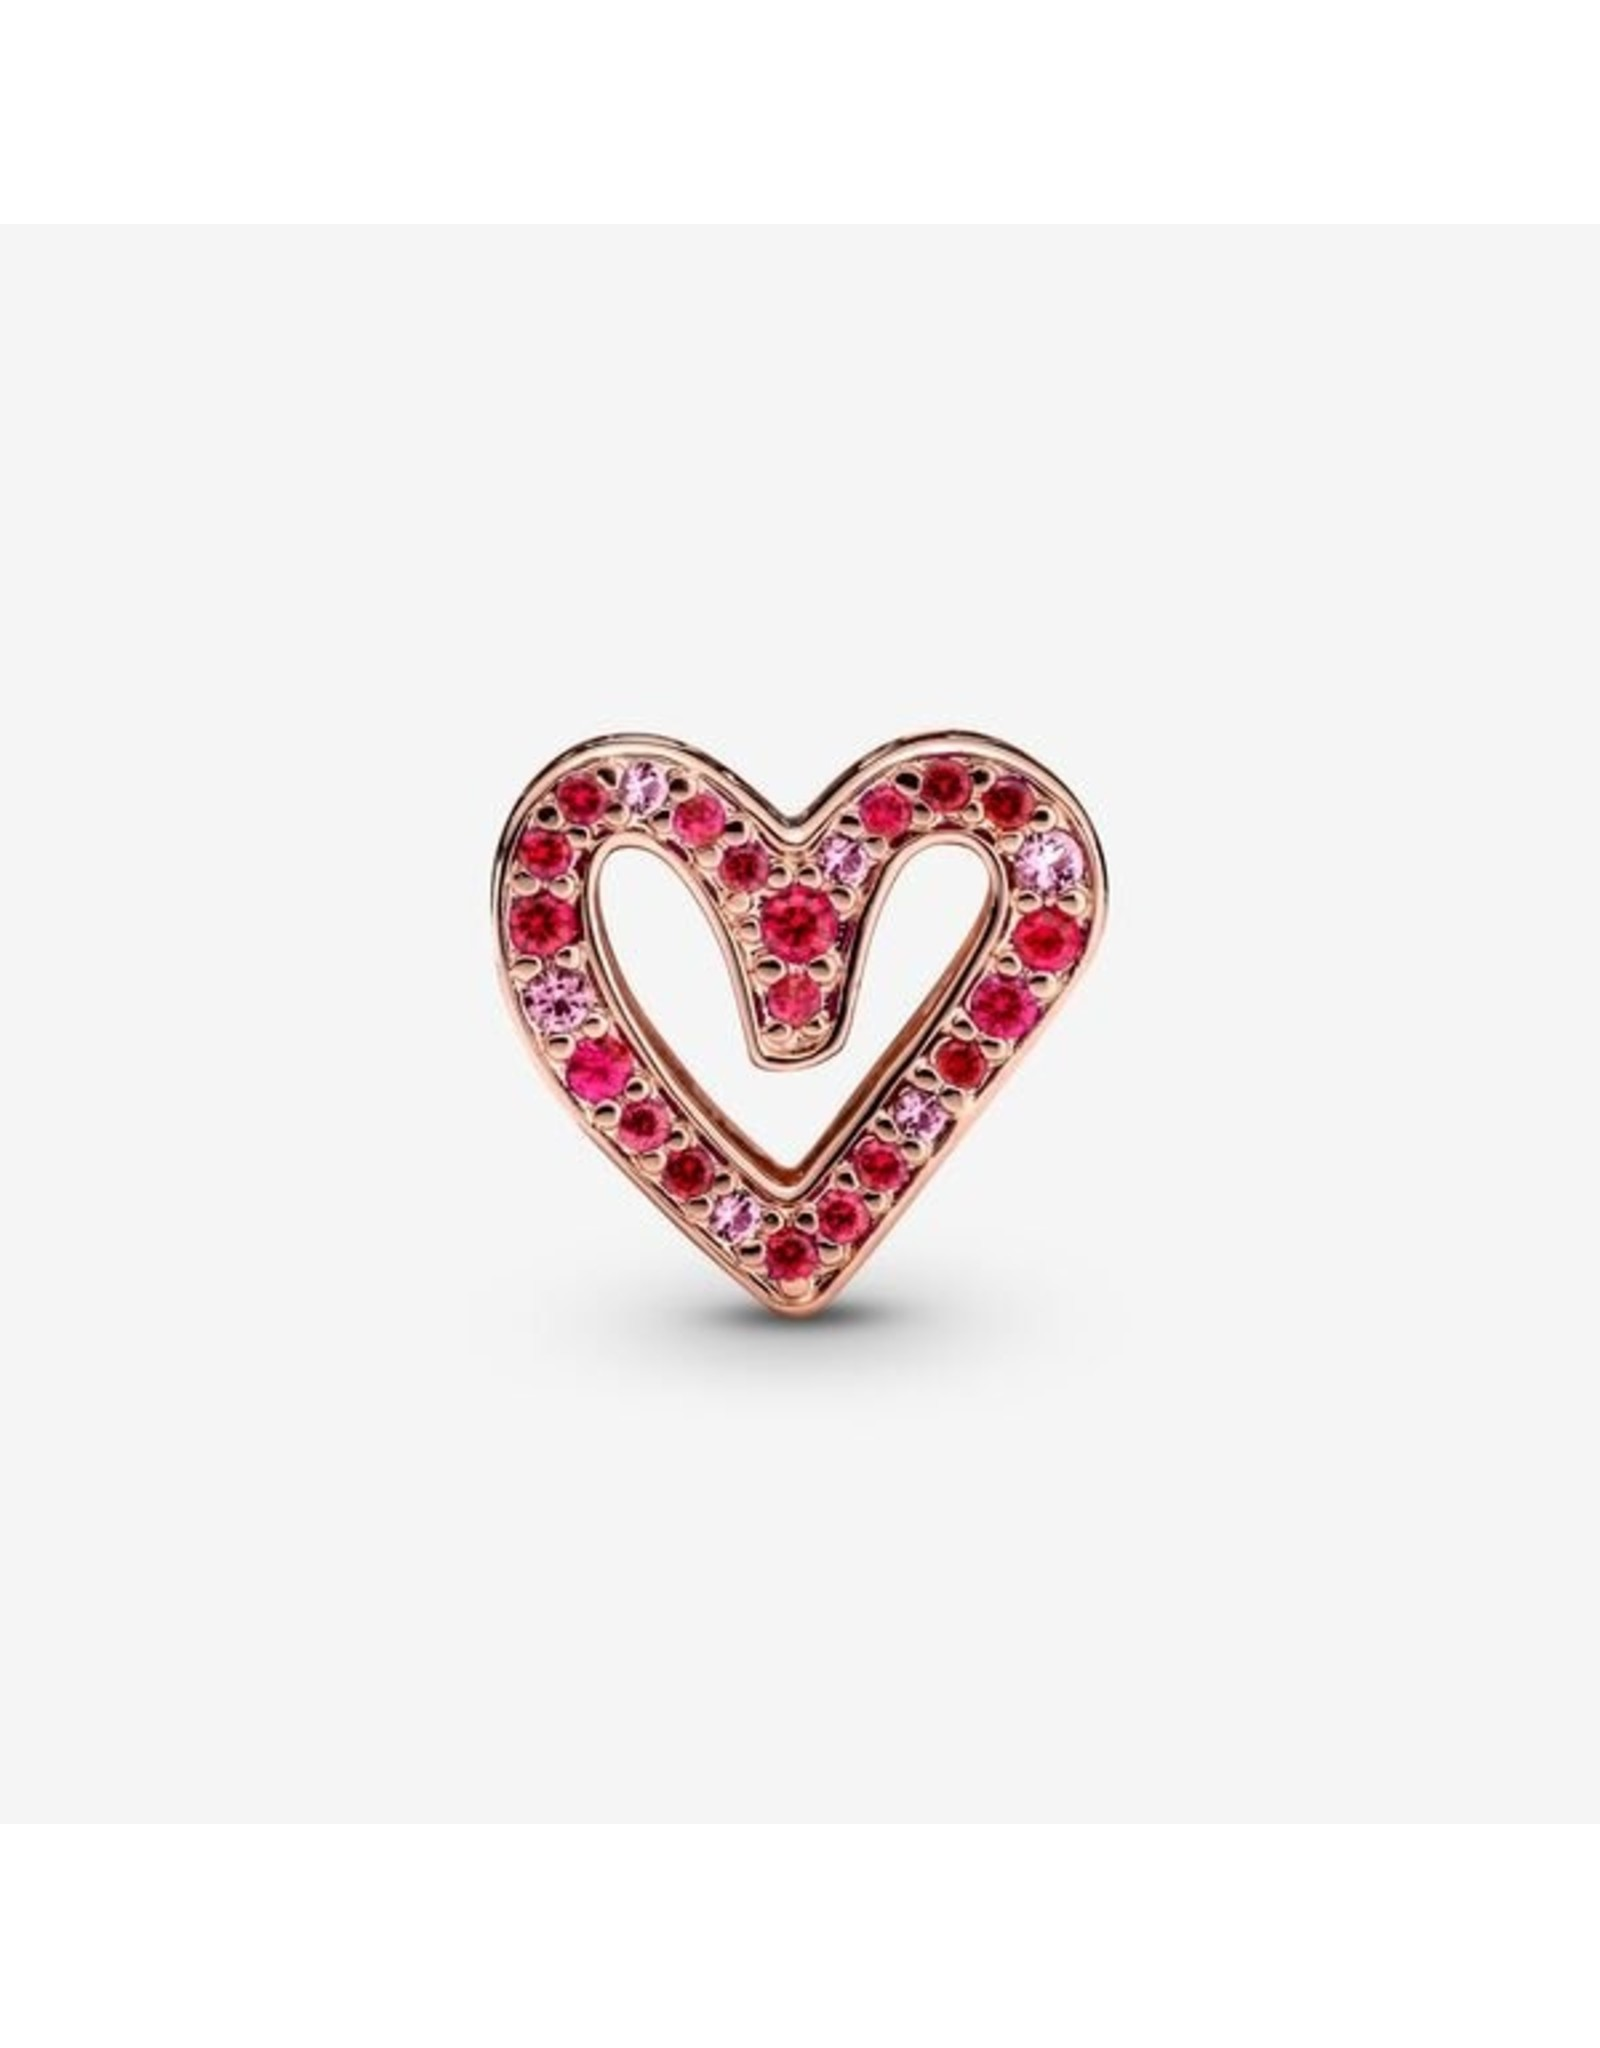 Pandora Pandora Charm,788692C02, Sparkling Ruby Red & Pink Freehand Heart